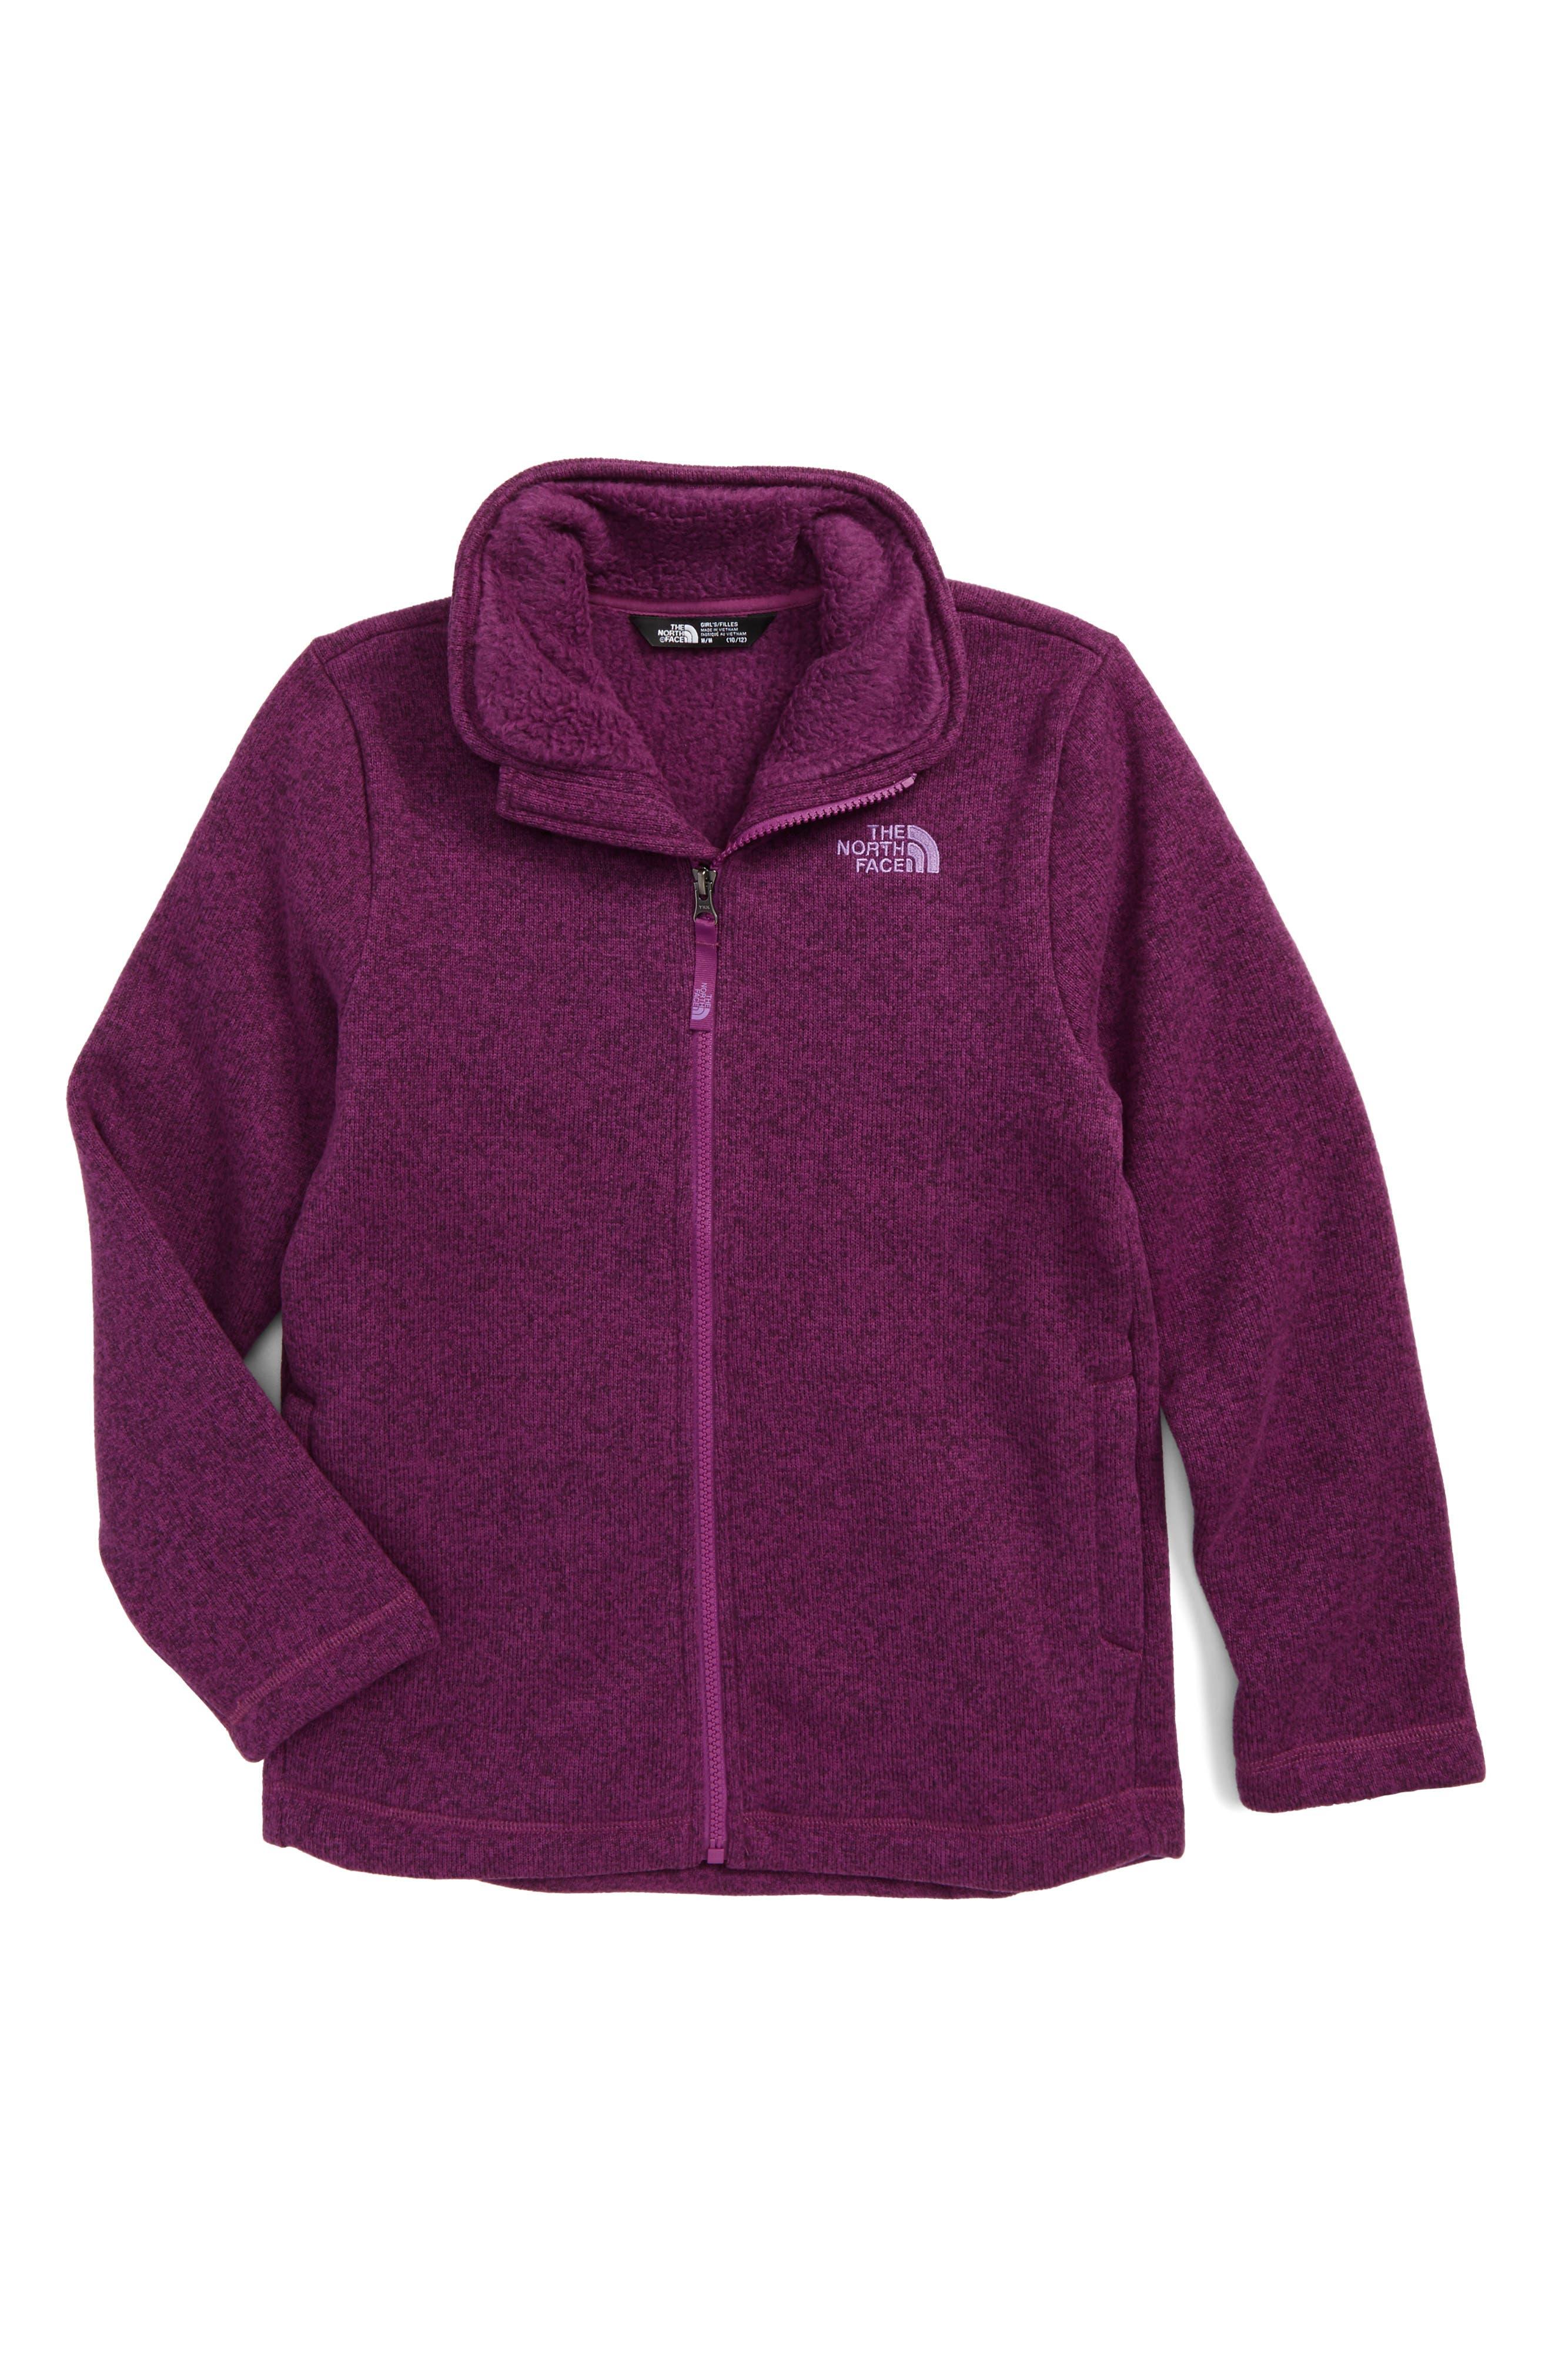 Crescent Fleece Jacket,                             Main thumbnail 3, color,